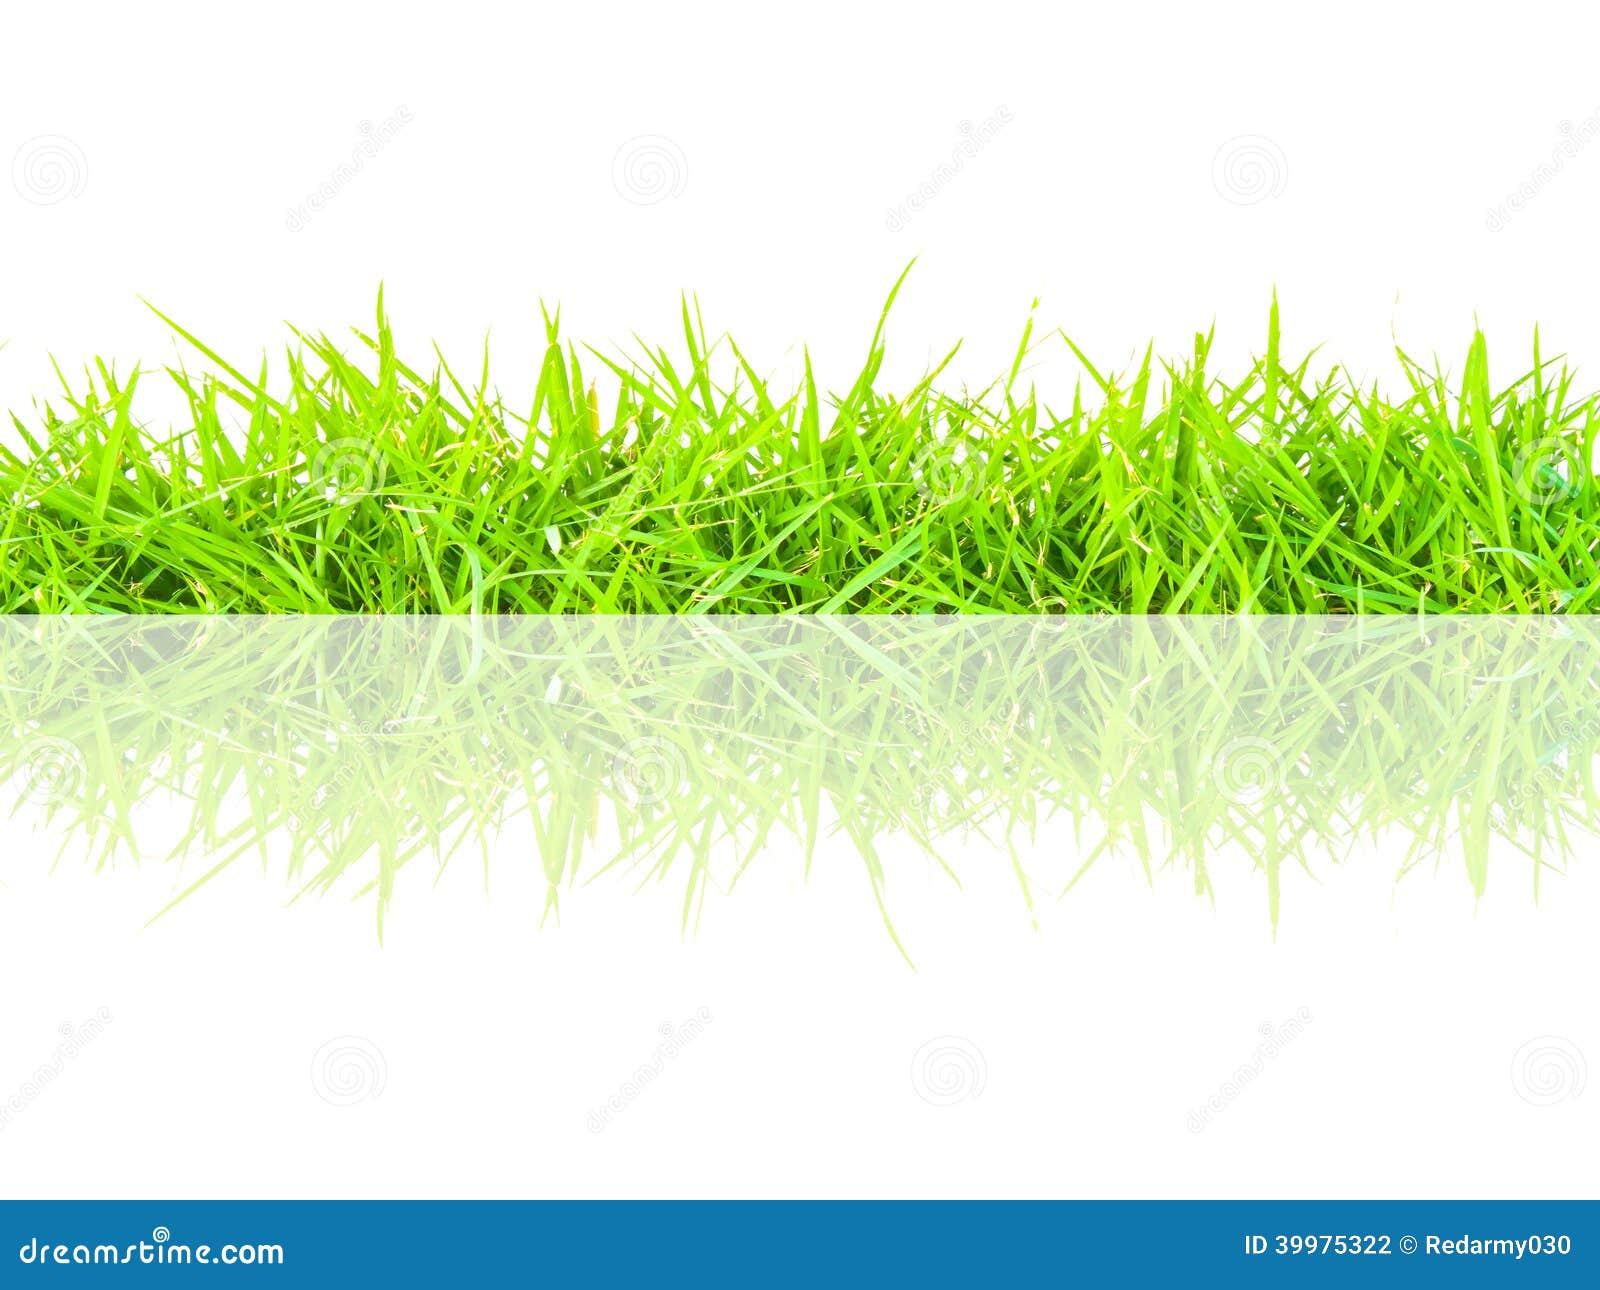 Spring green grass seamless border stock photo image for Grass border